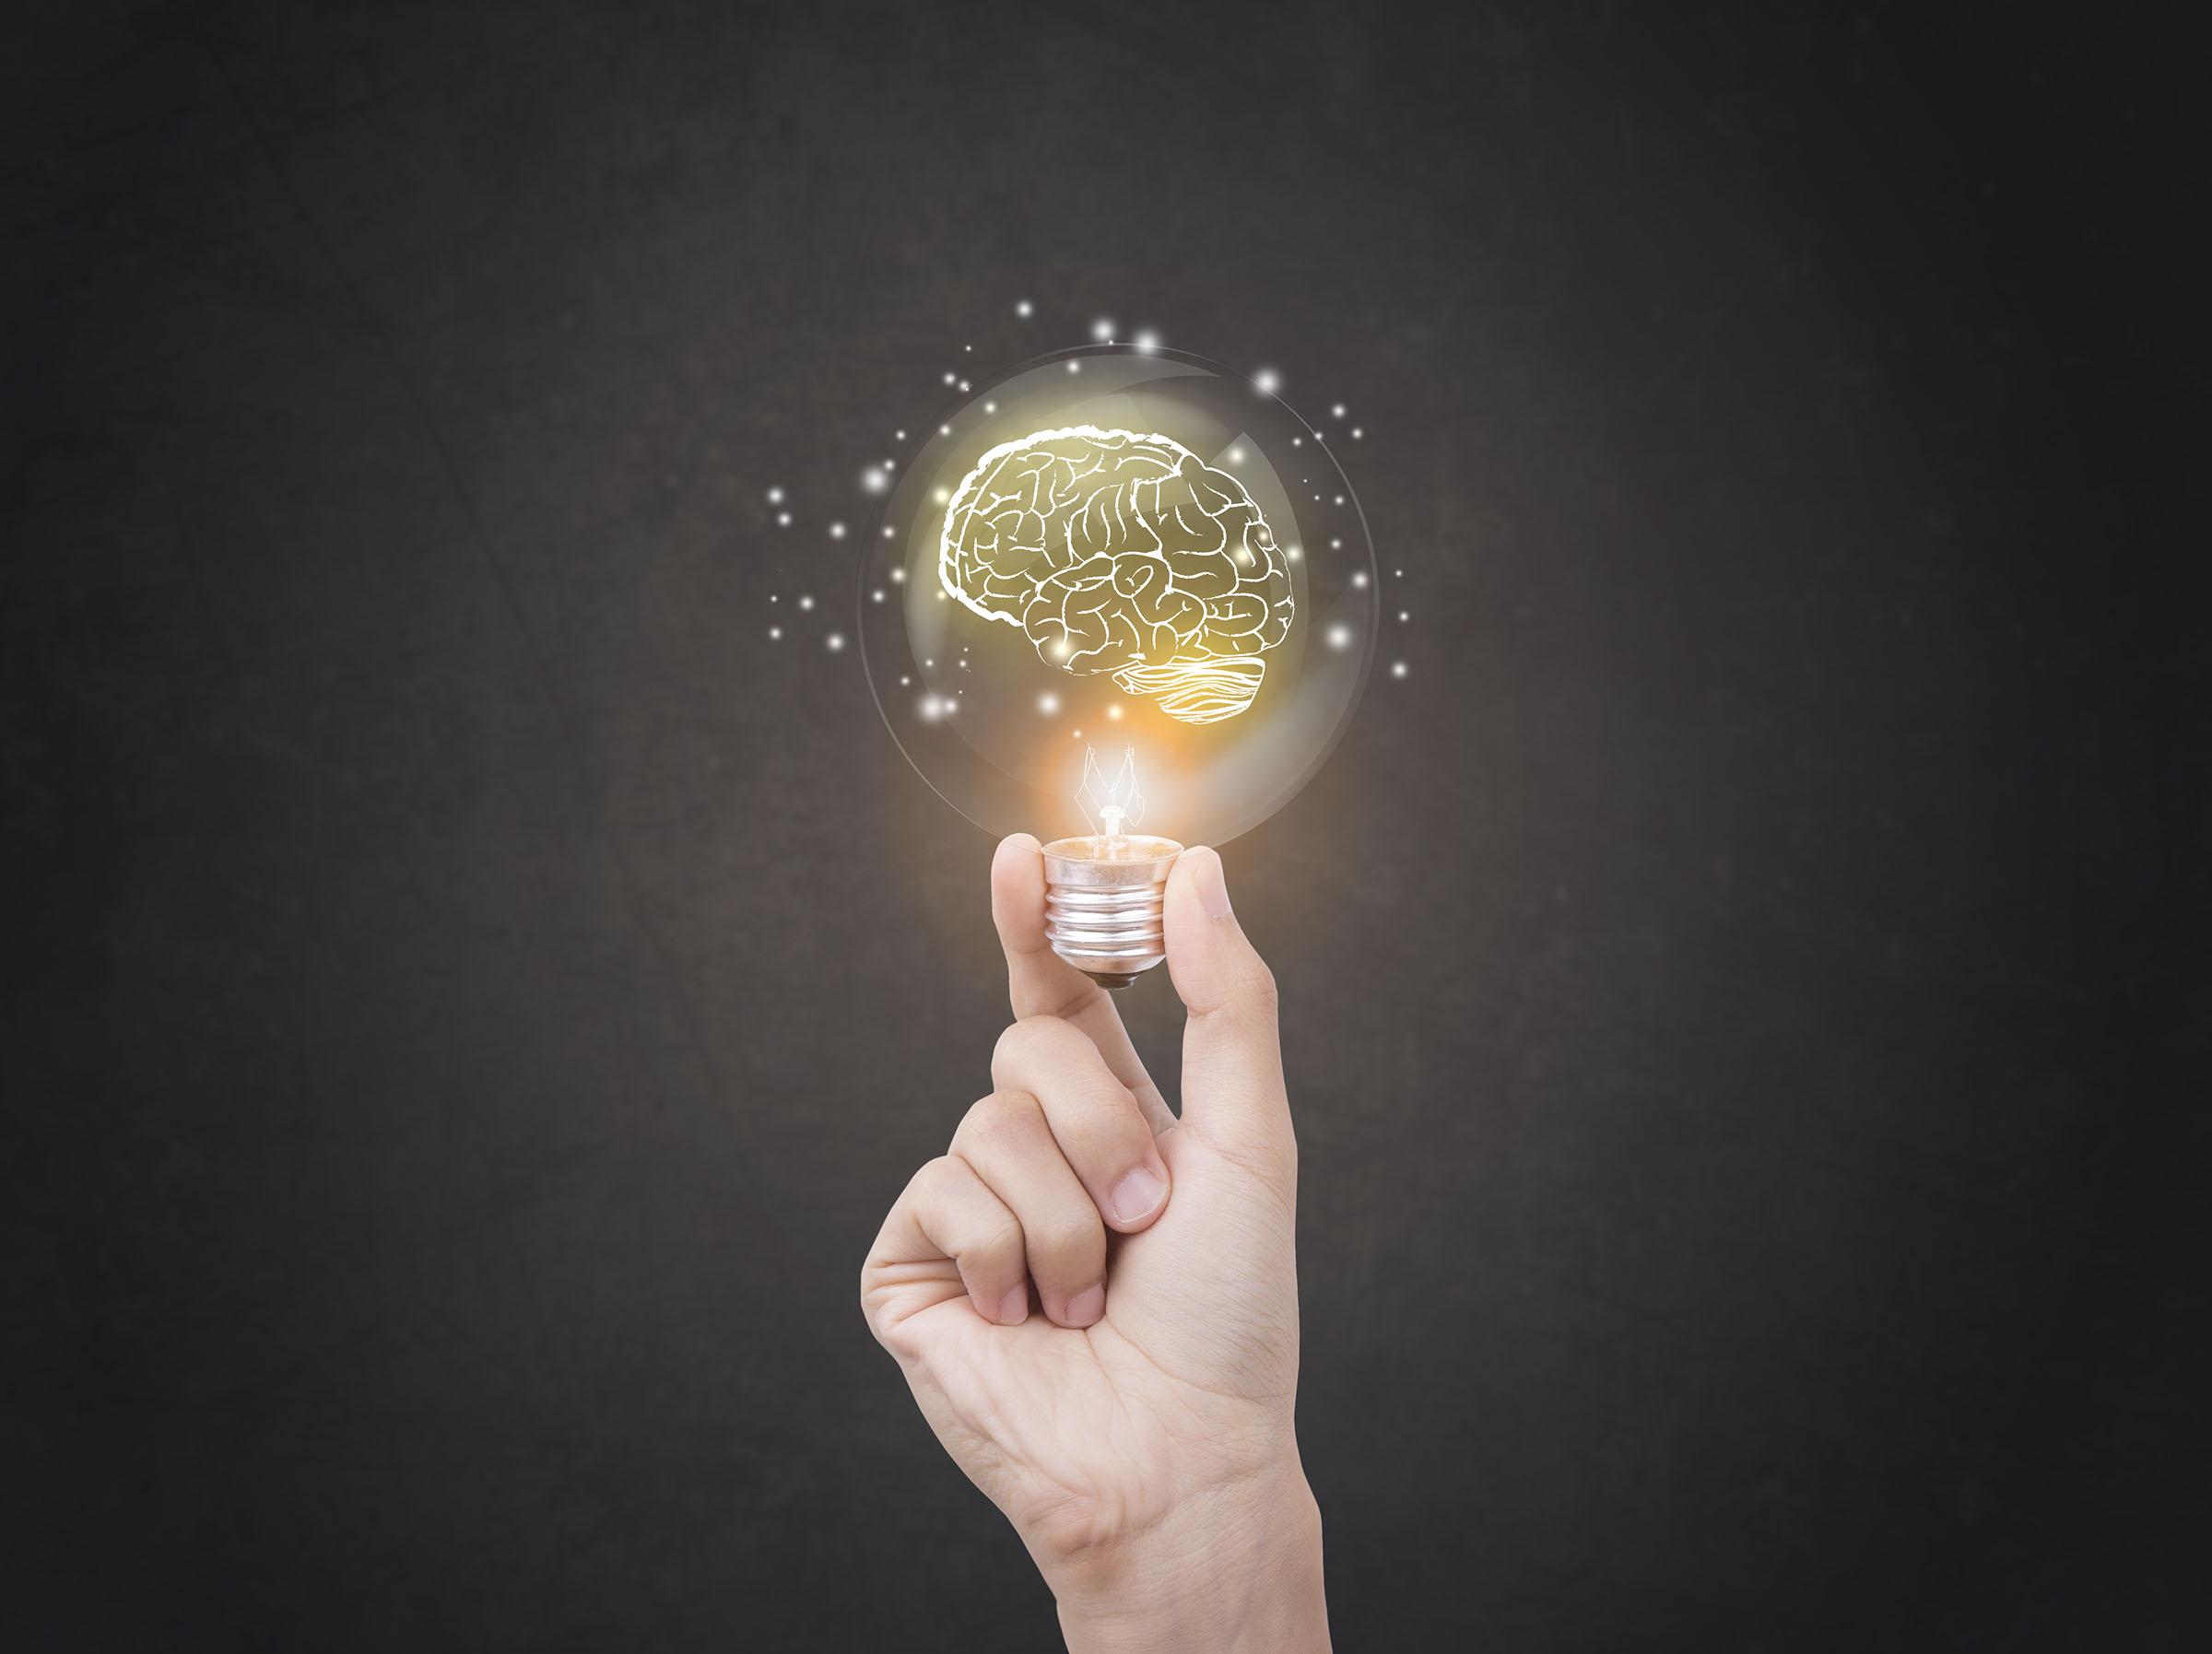 Innovation through education